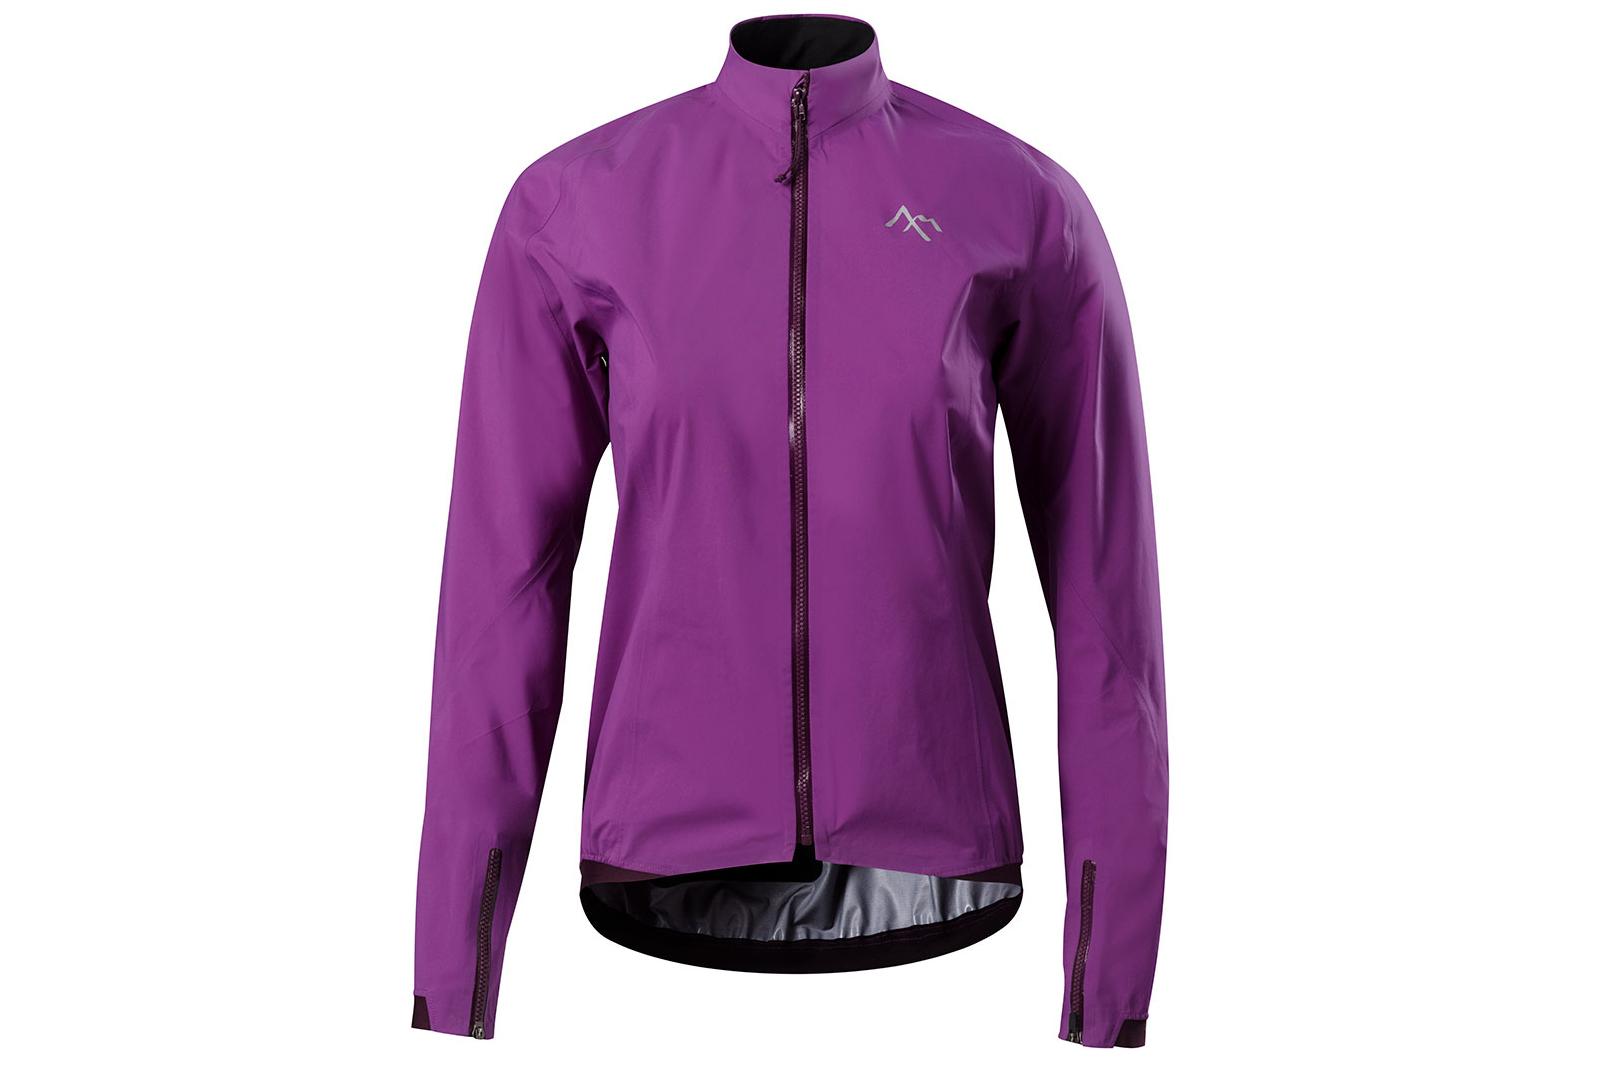 30d98d538 Best Women s Road Cycling Accessories. Raincoat – 7Mesh Re Gen Rain Jacket    300